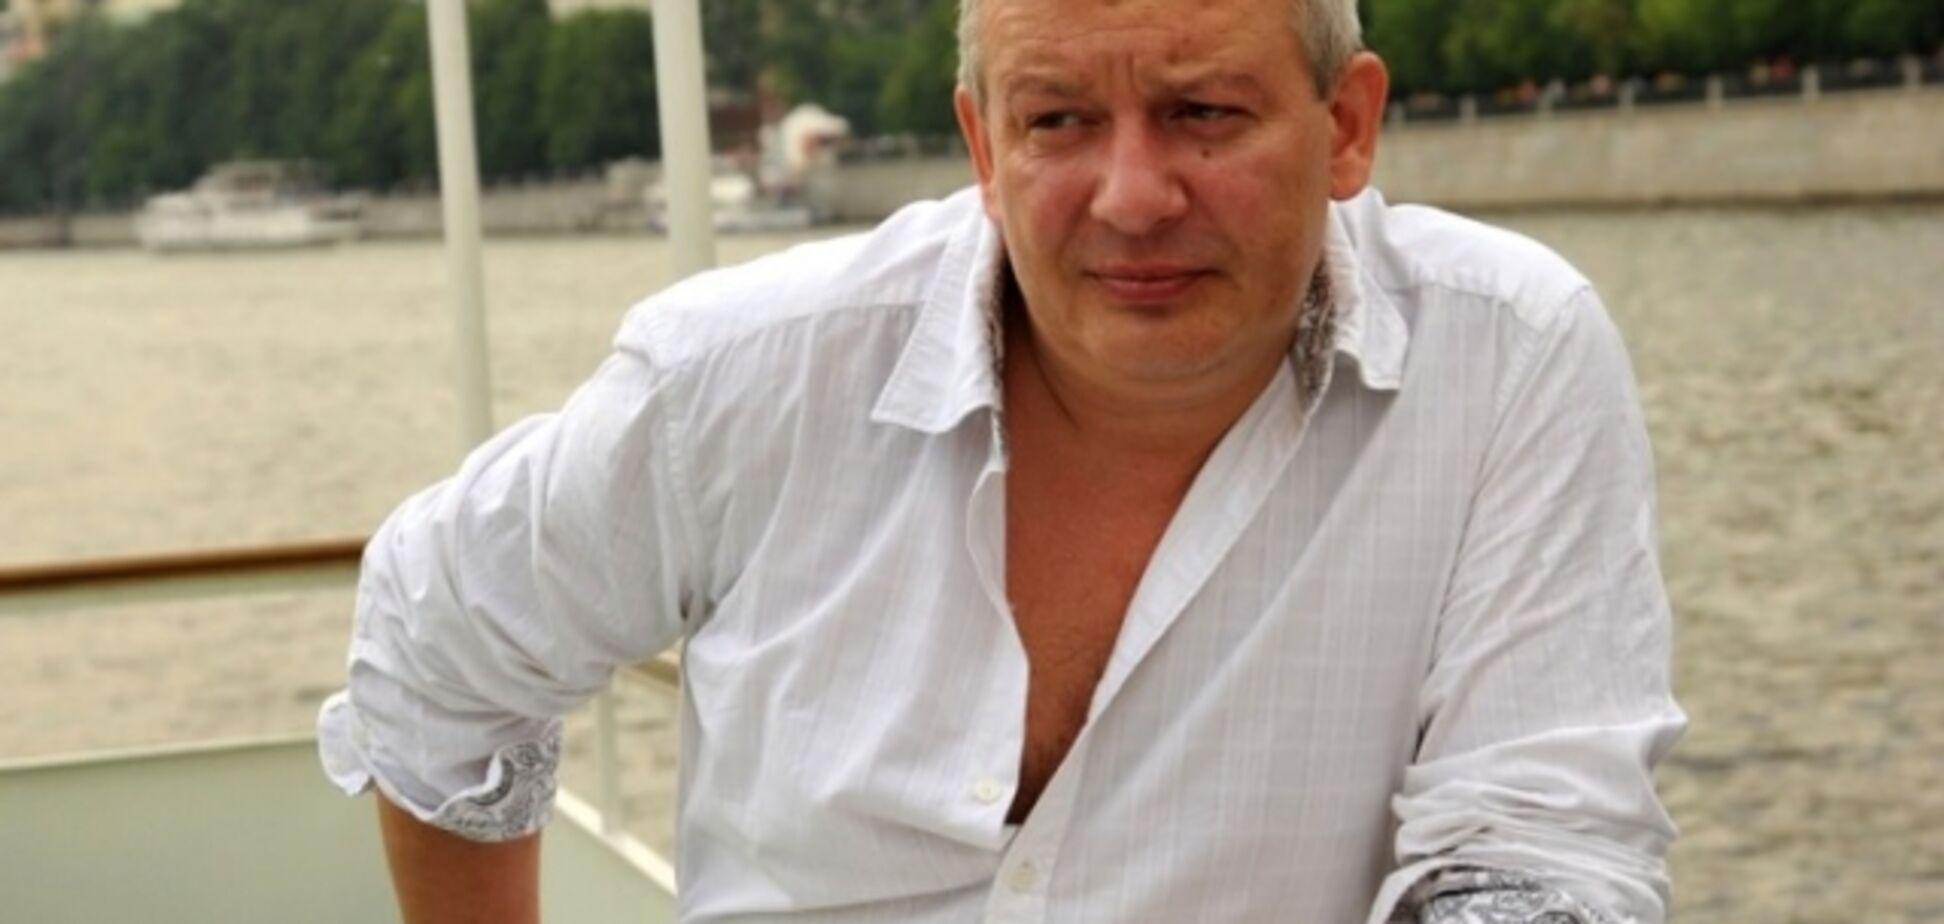 Не просто тромб: озвучена официальная причина смерти Марьянова